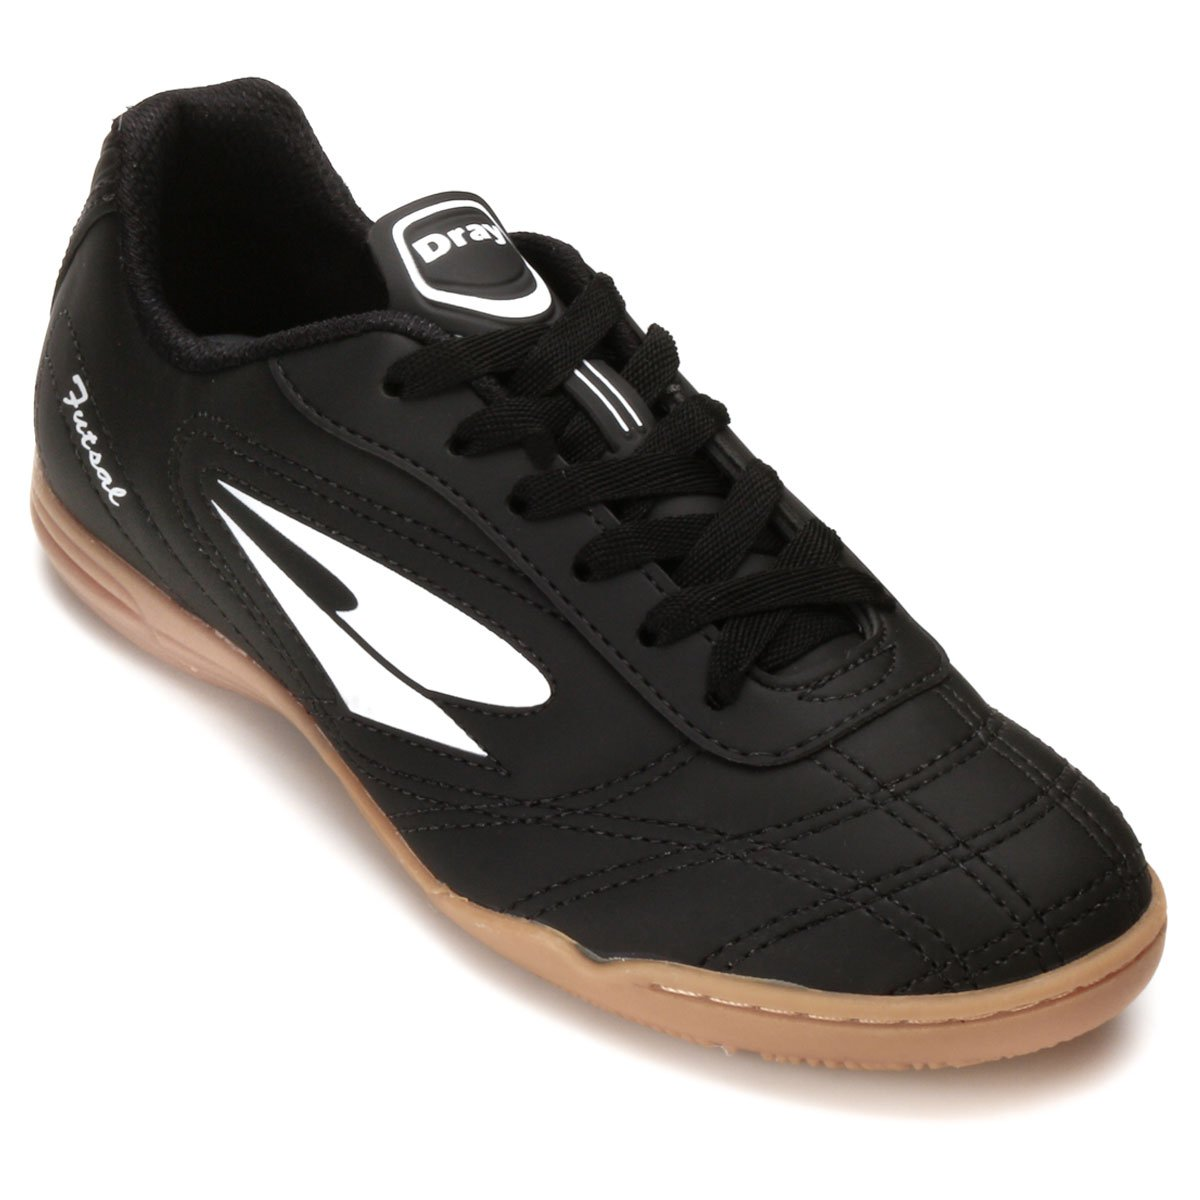 Chuteira Futsal Dray Indoor Masculina - Preto